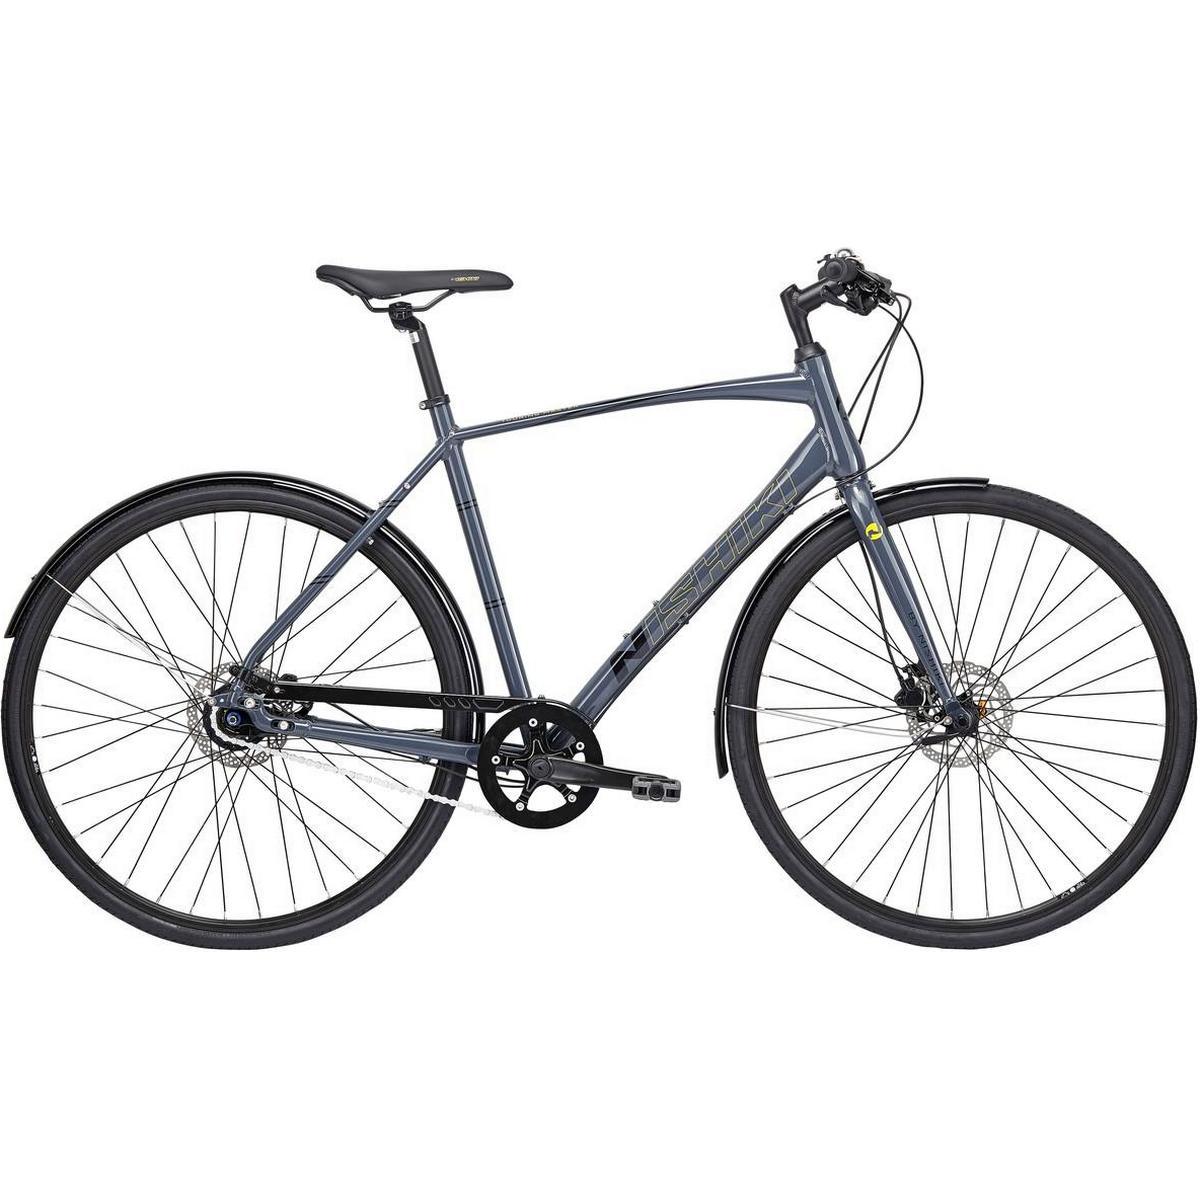 ffffee92b4f Nishiki Cykler - Sammenlign priser hos PriceRunner